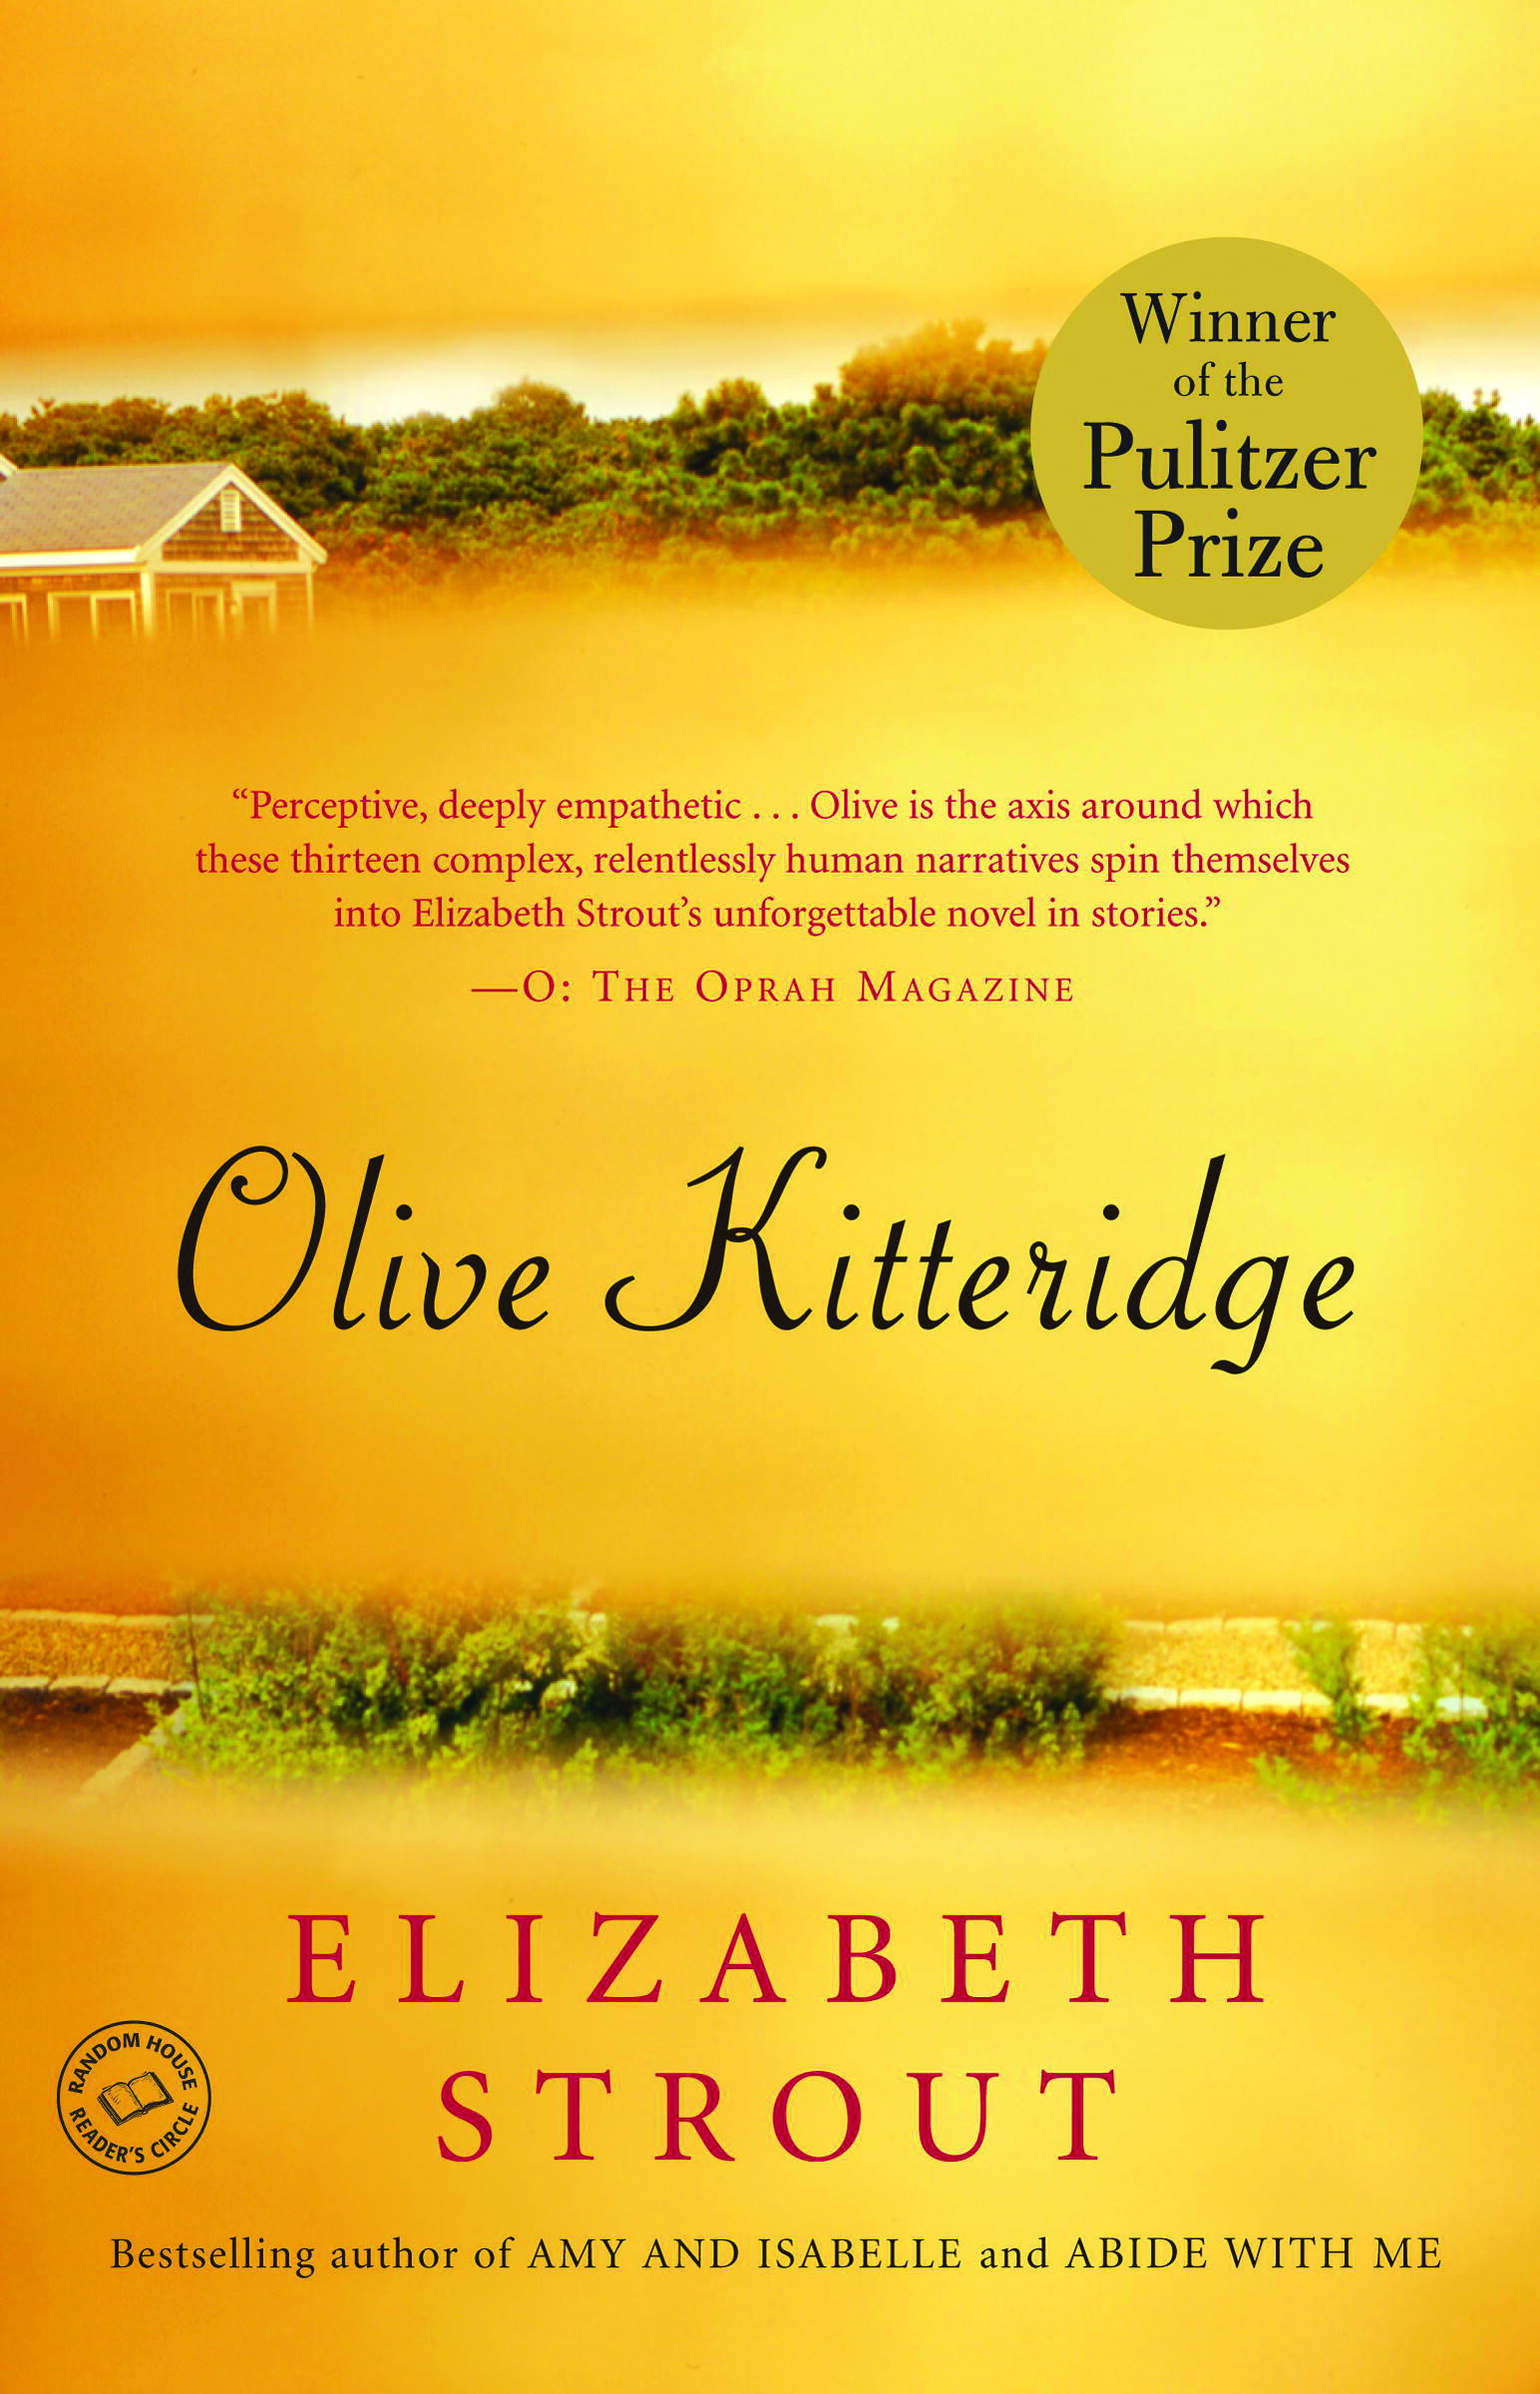 Olive Kitteridge By Elizabeth Strout 9780812971835 Penguinrandomhouse Com Books Olive Kitteridge Good Books Books To Read